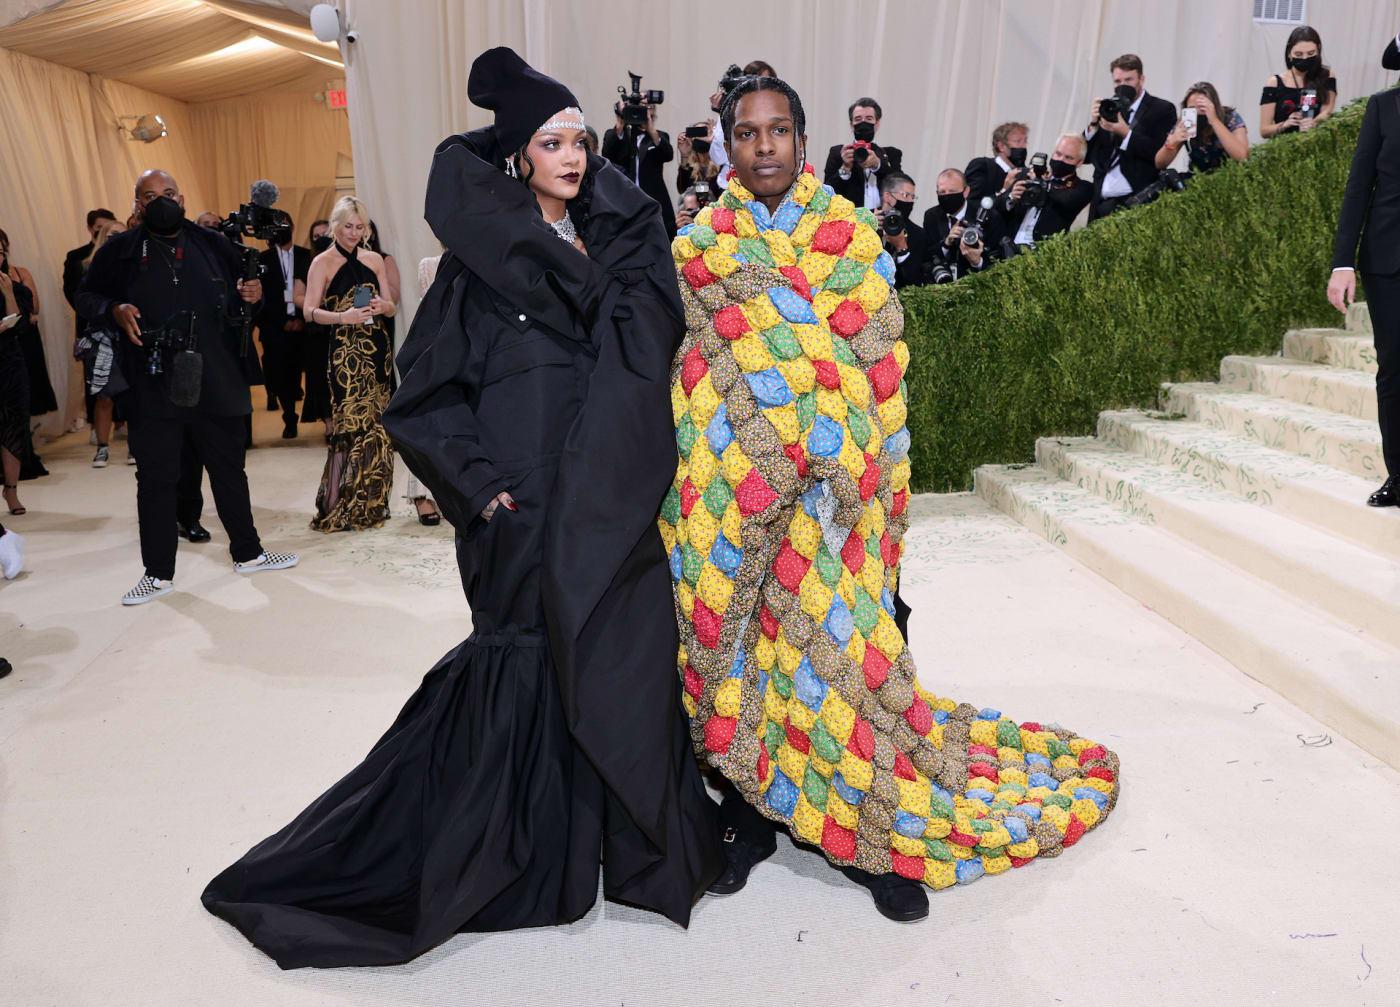 Rihanna and ASAP Rocky Stylish Moments Including Met Gala